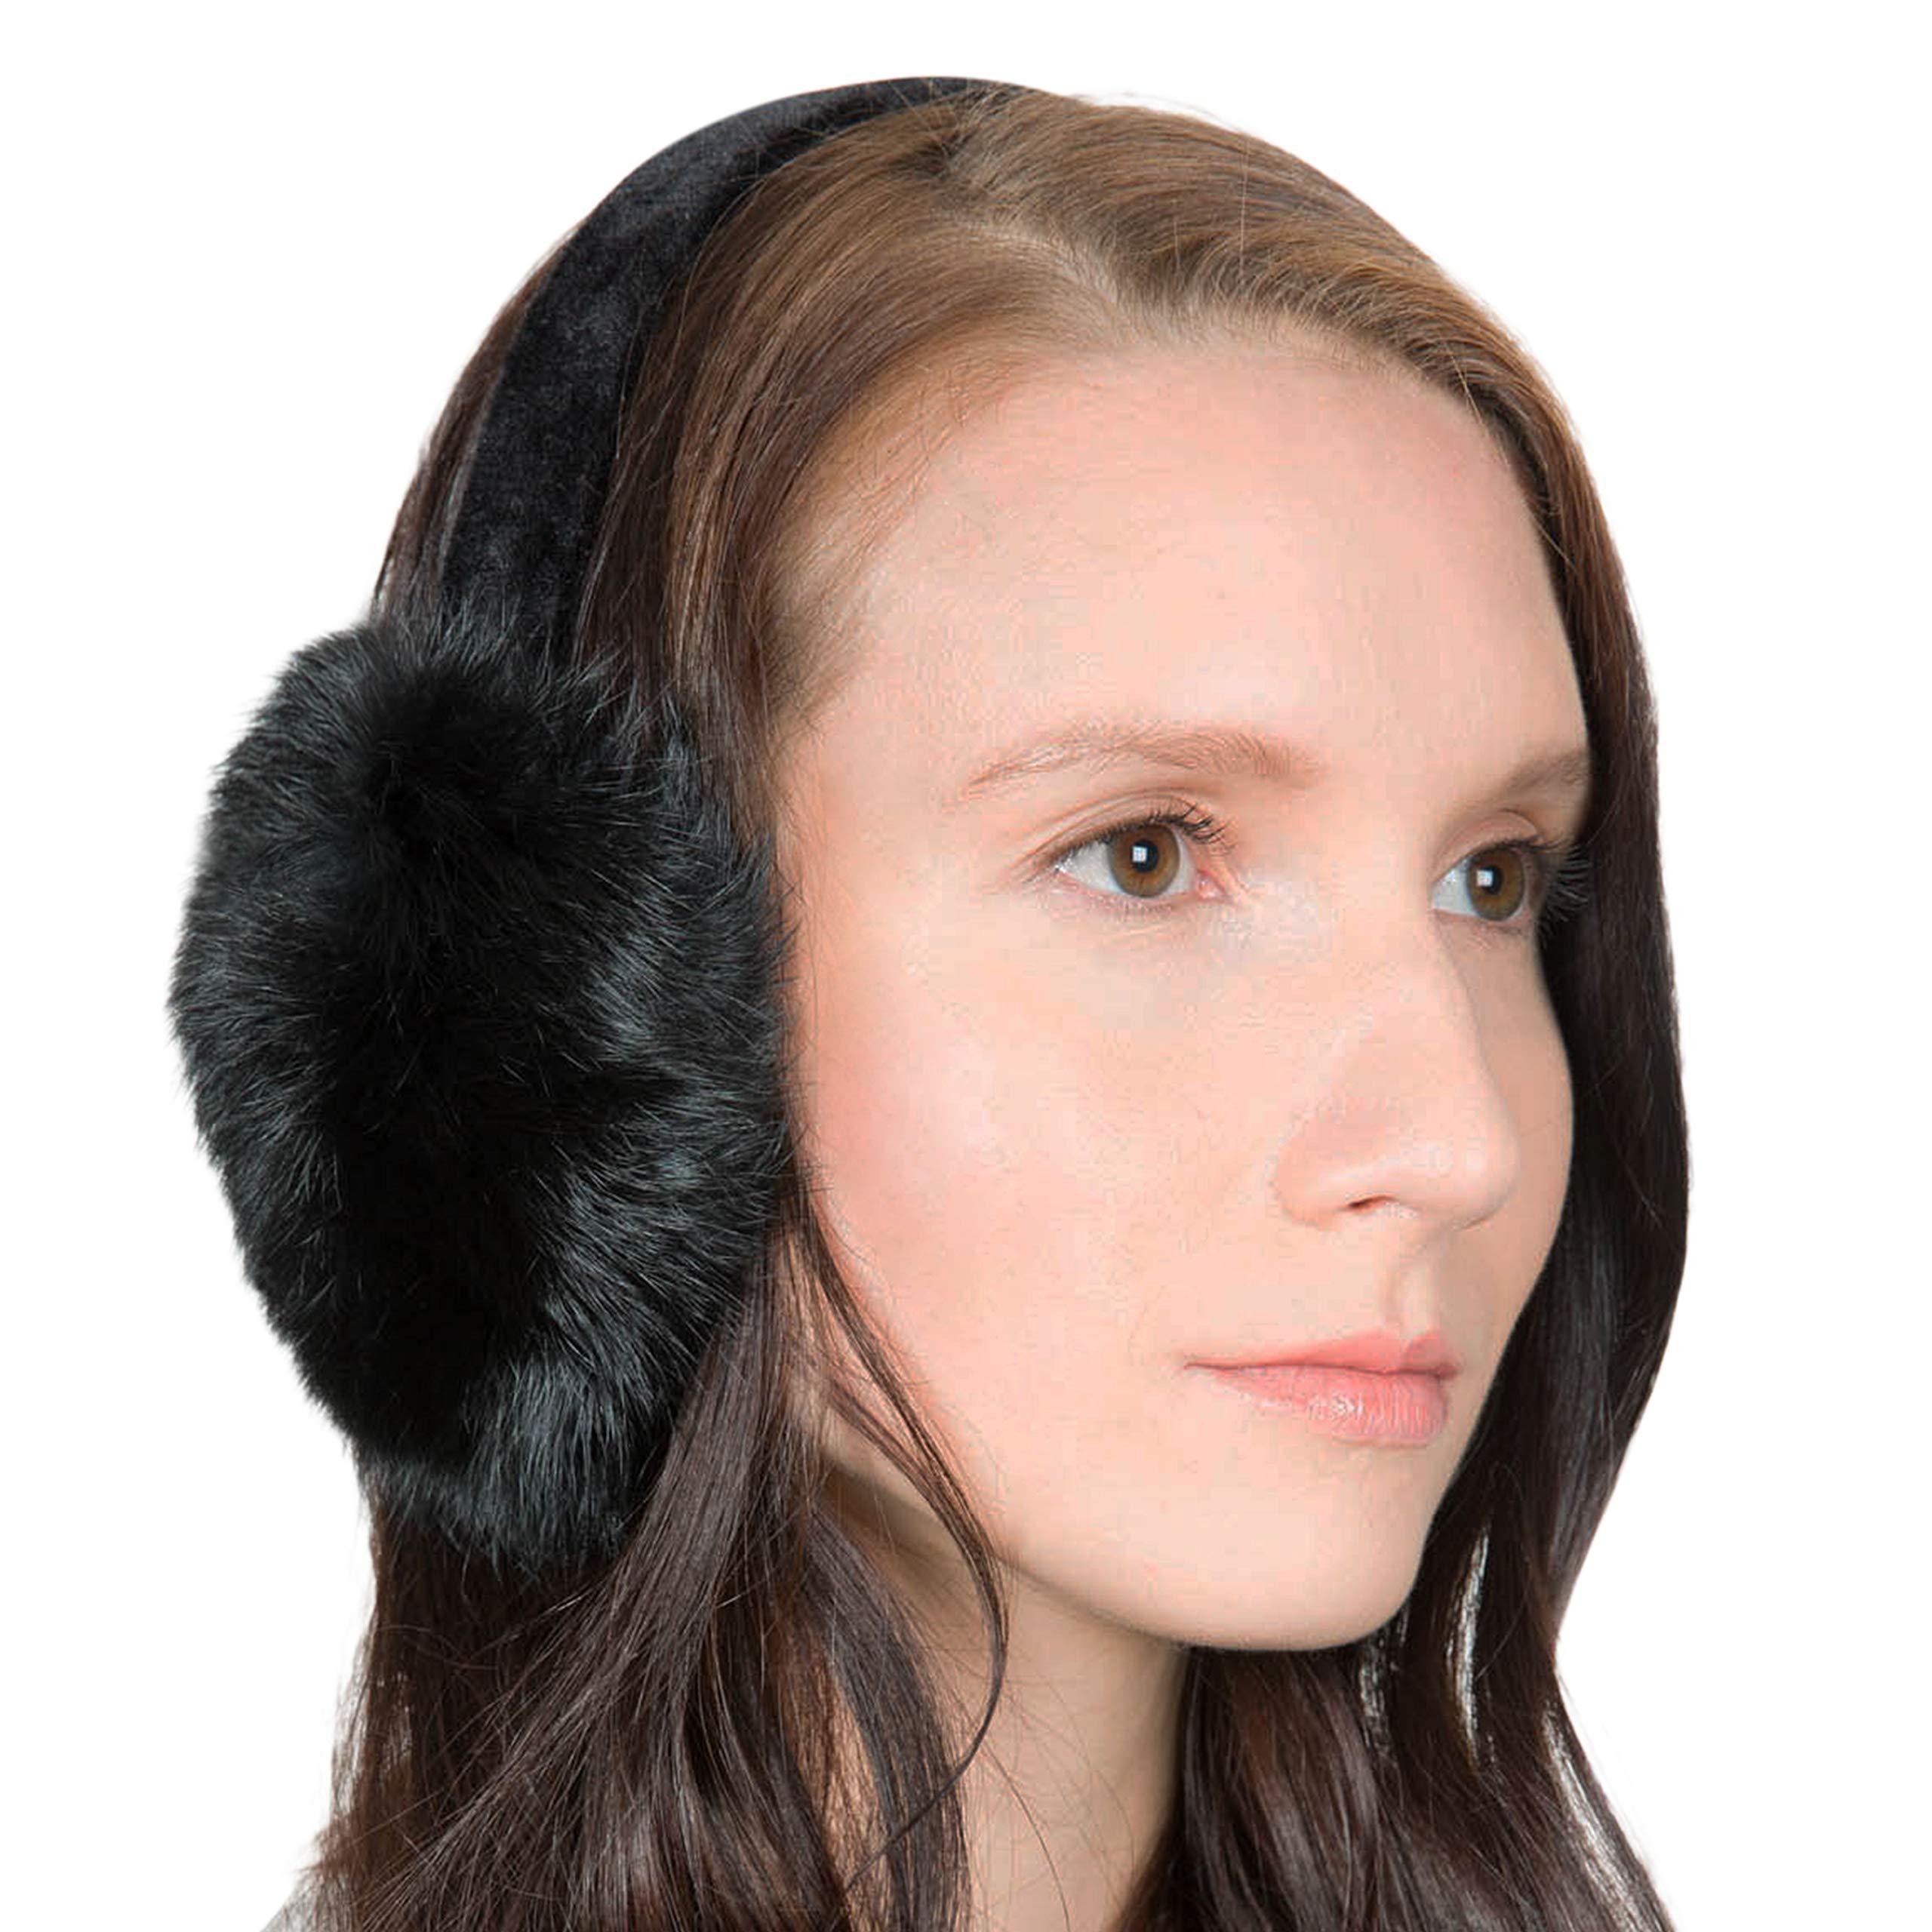 OBURLA Fur Earmuffs | Luxurious Real Fur Over Ear Warmers with Headband (Rabbit Fur, Black)